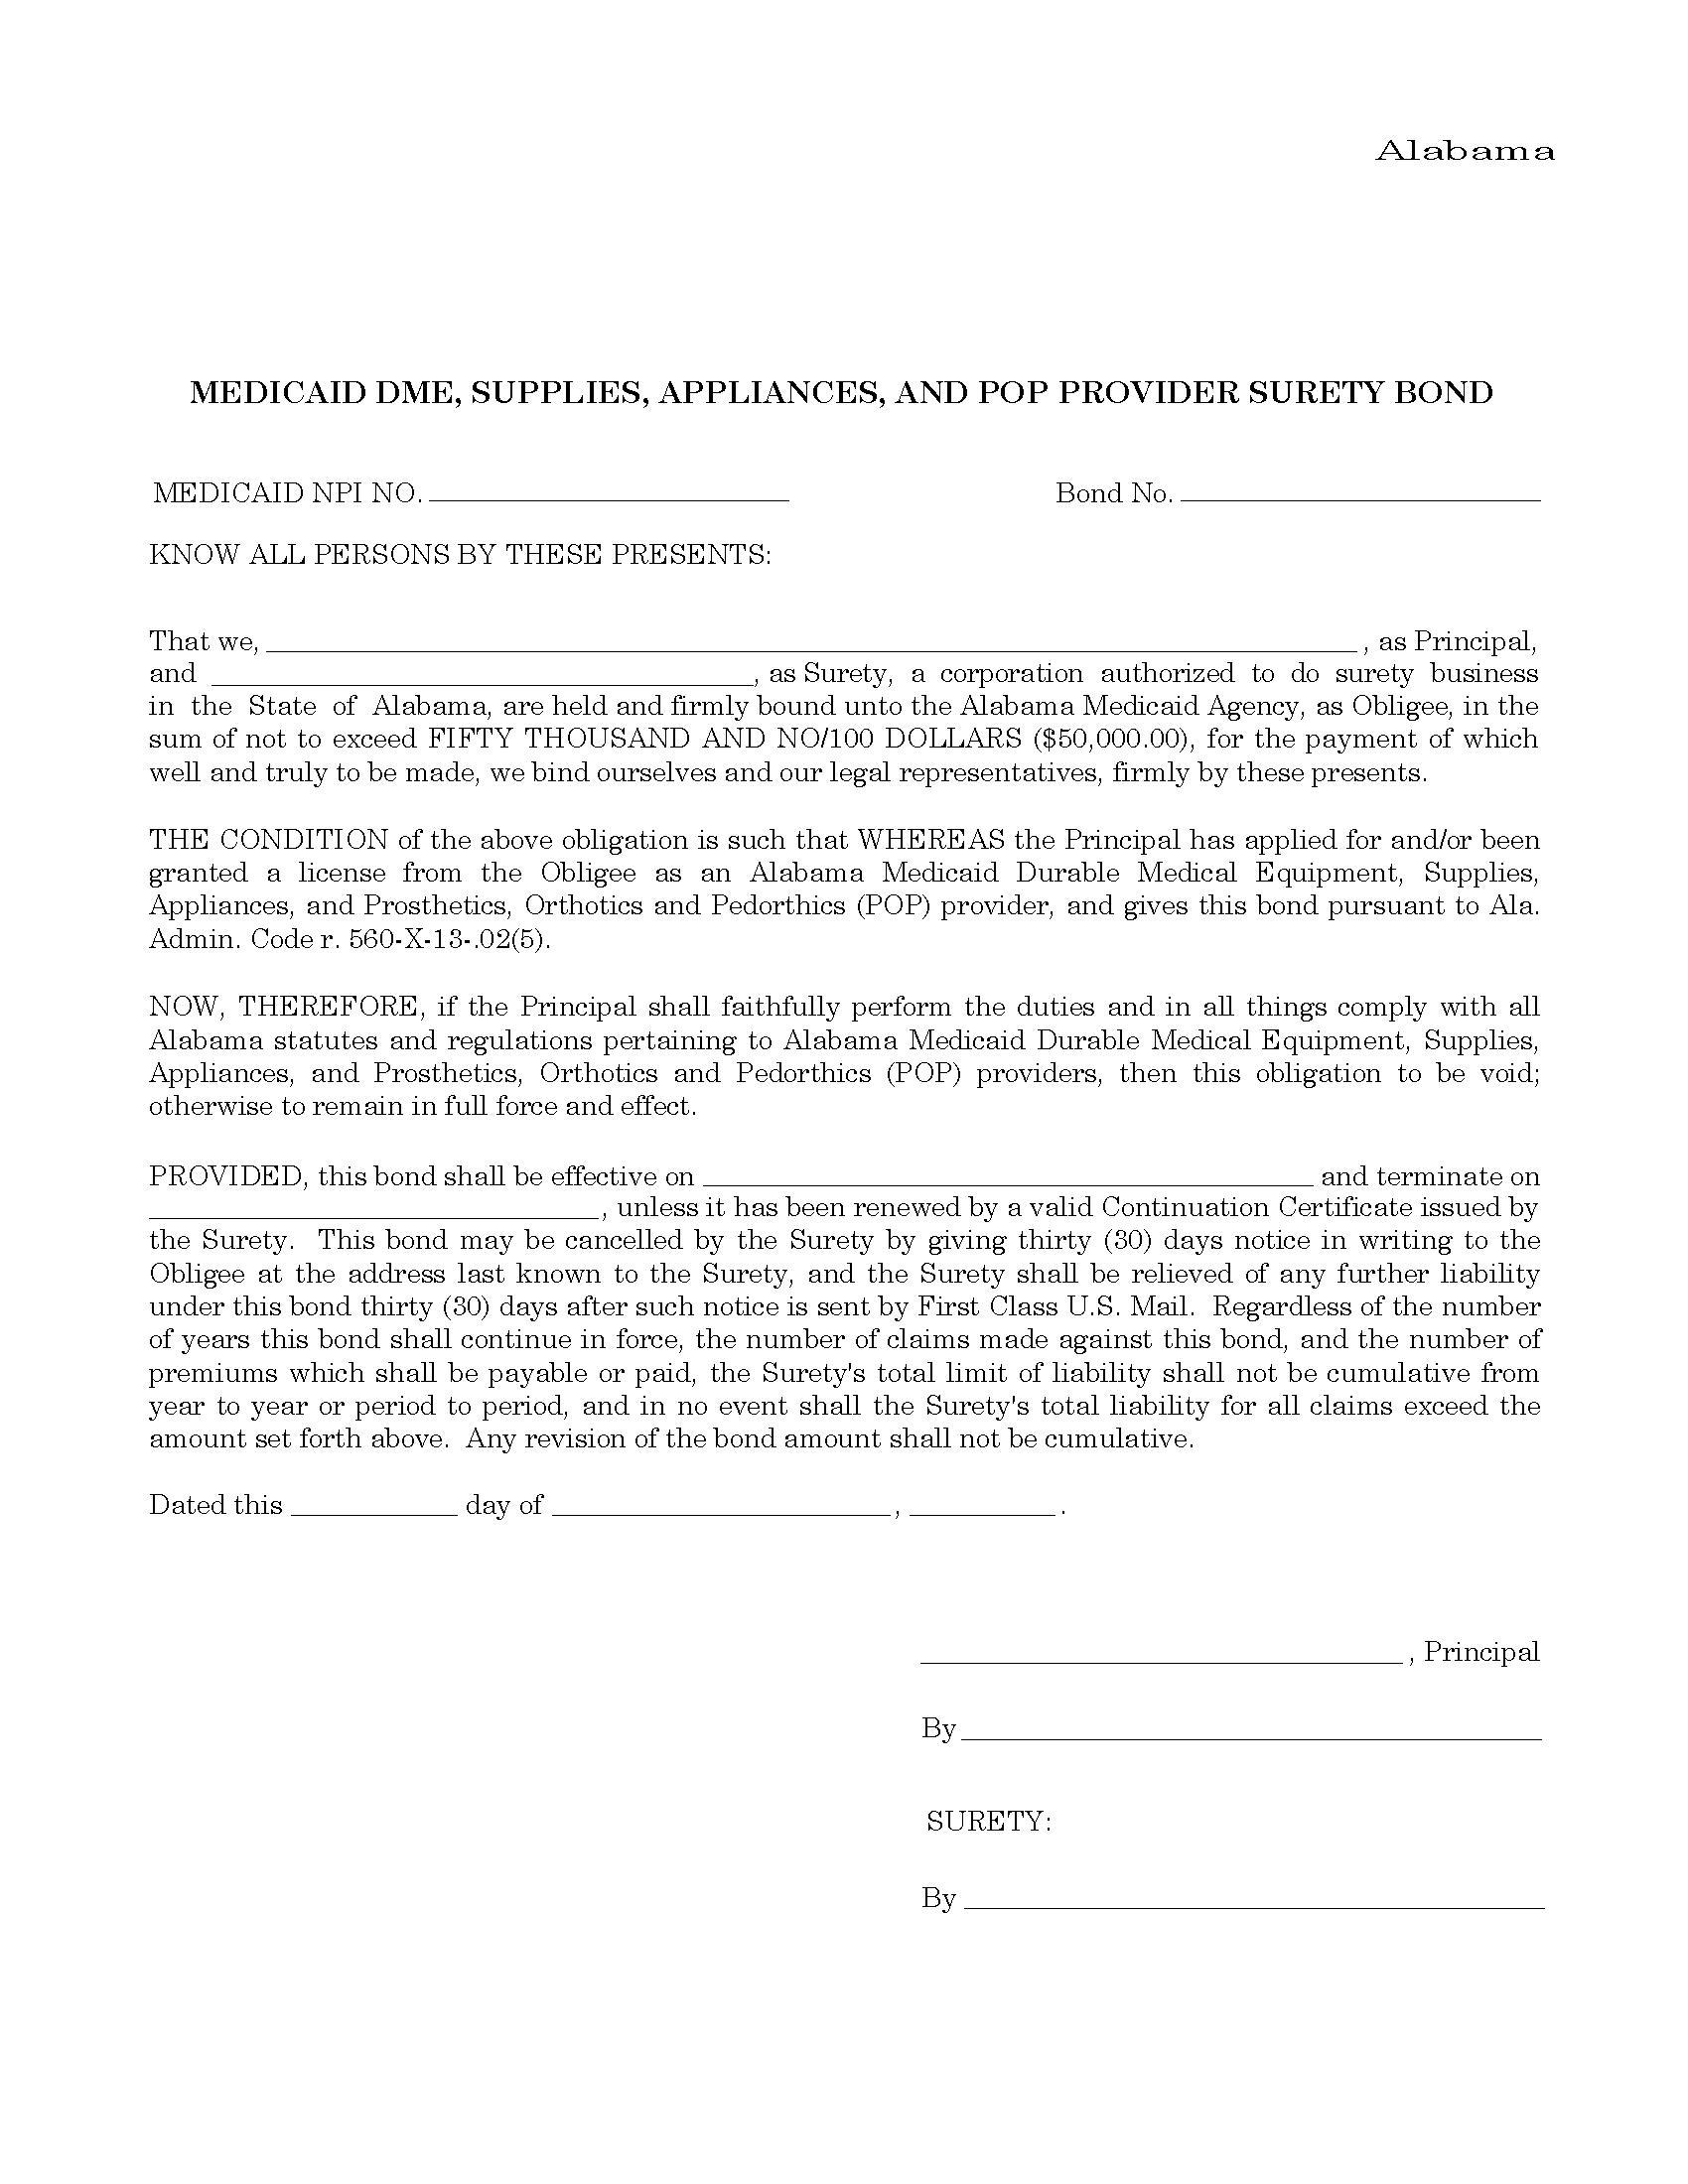 State of Alabama Medicaid DME and Medical Supply Provider Bond sample image